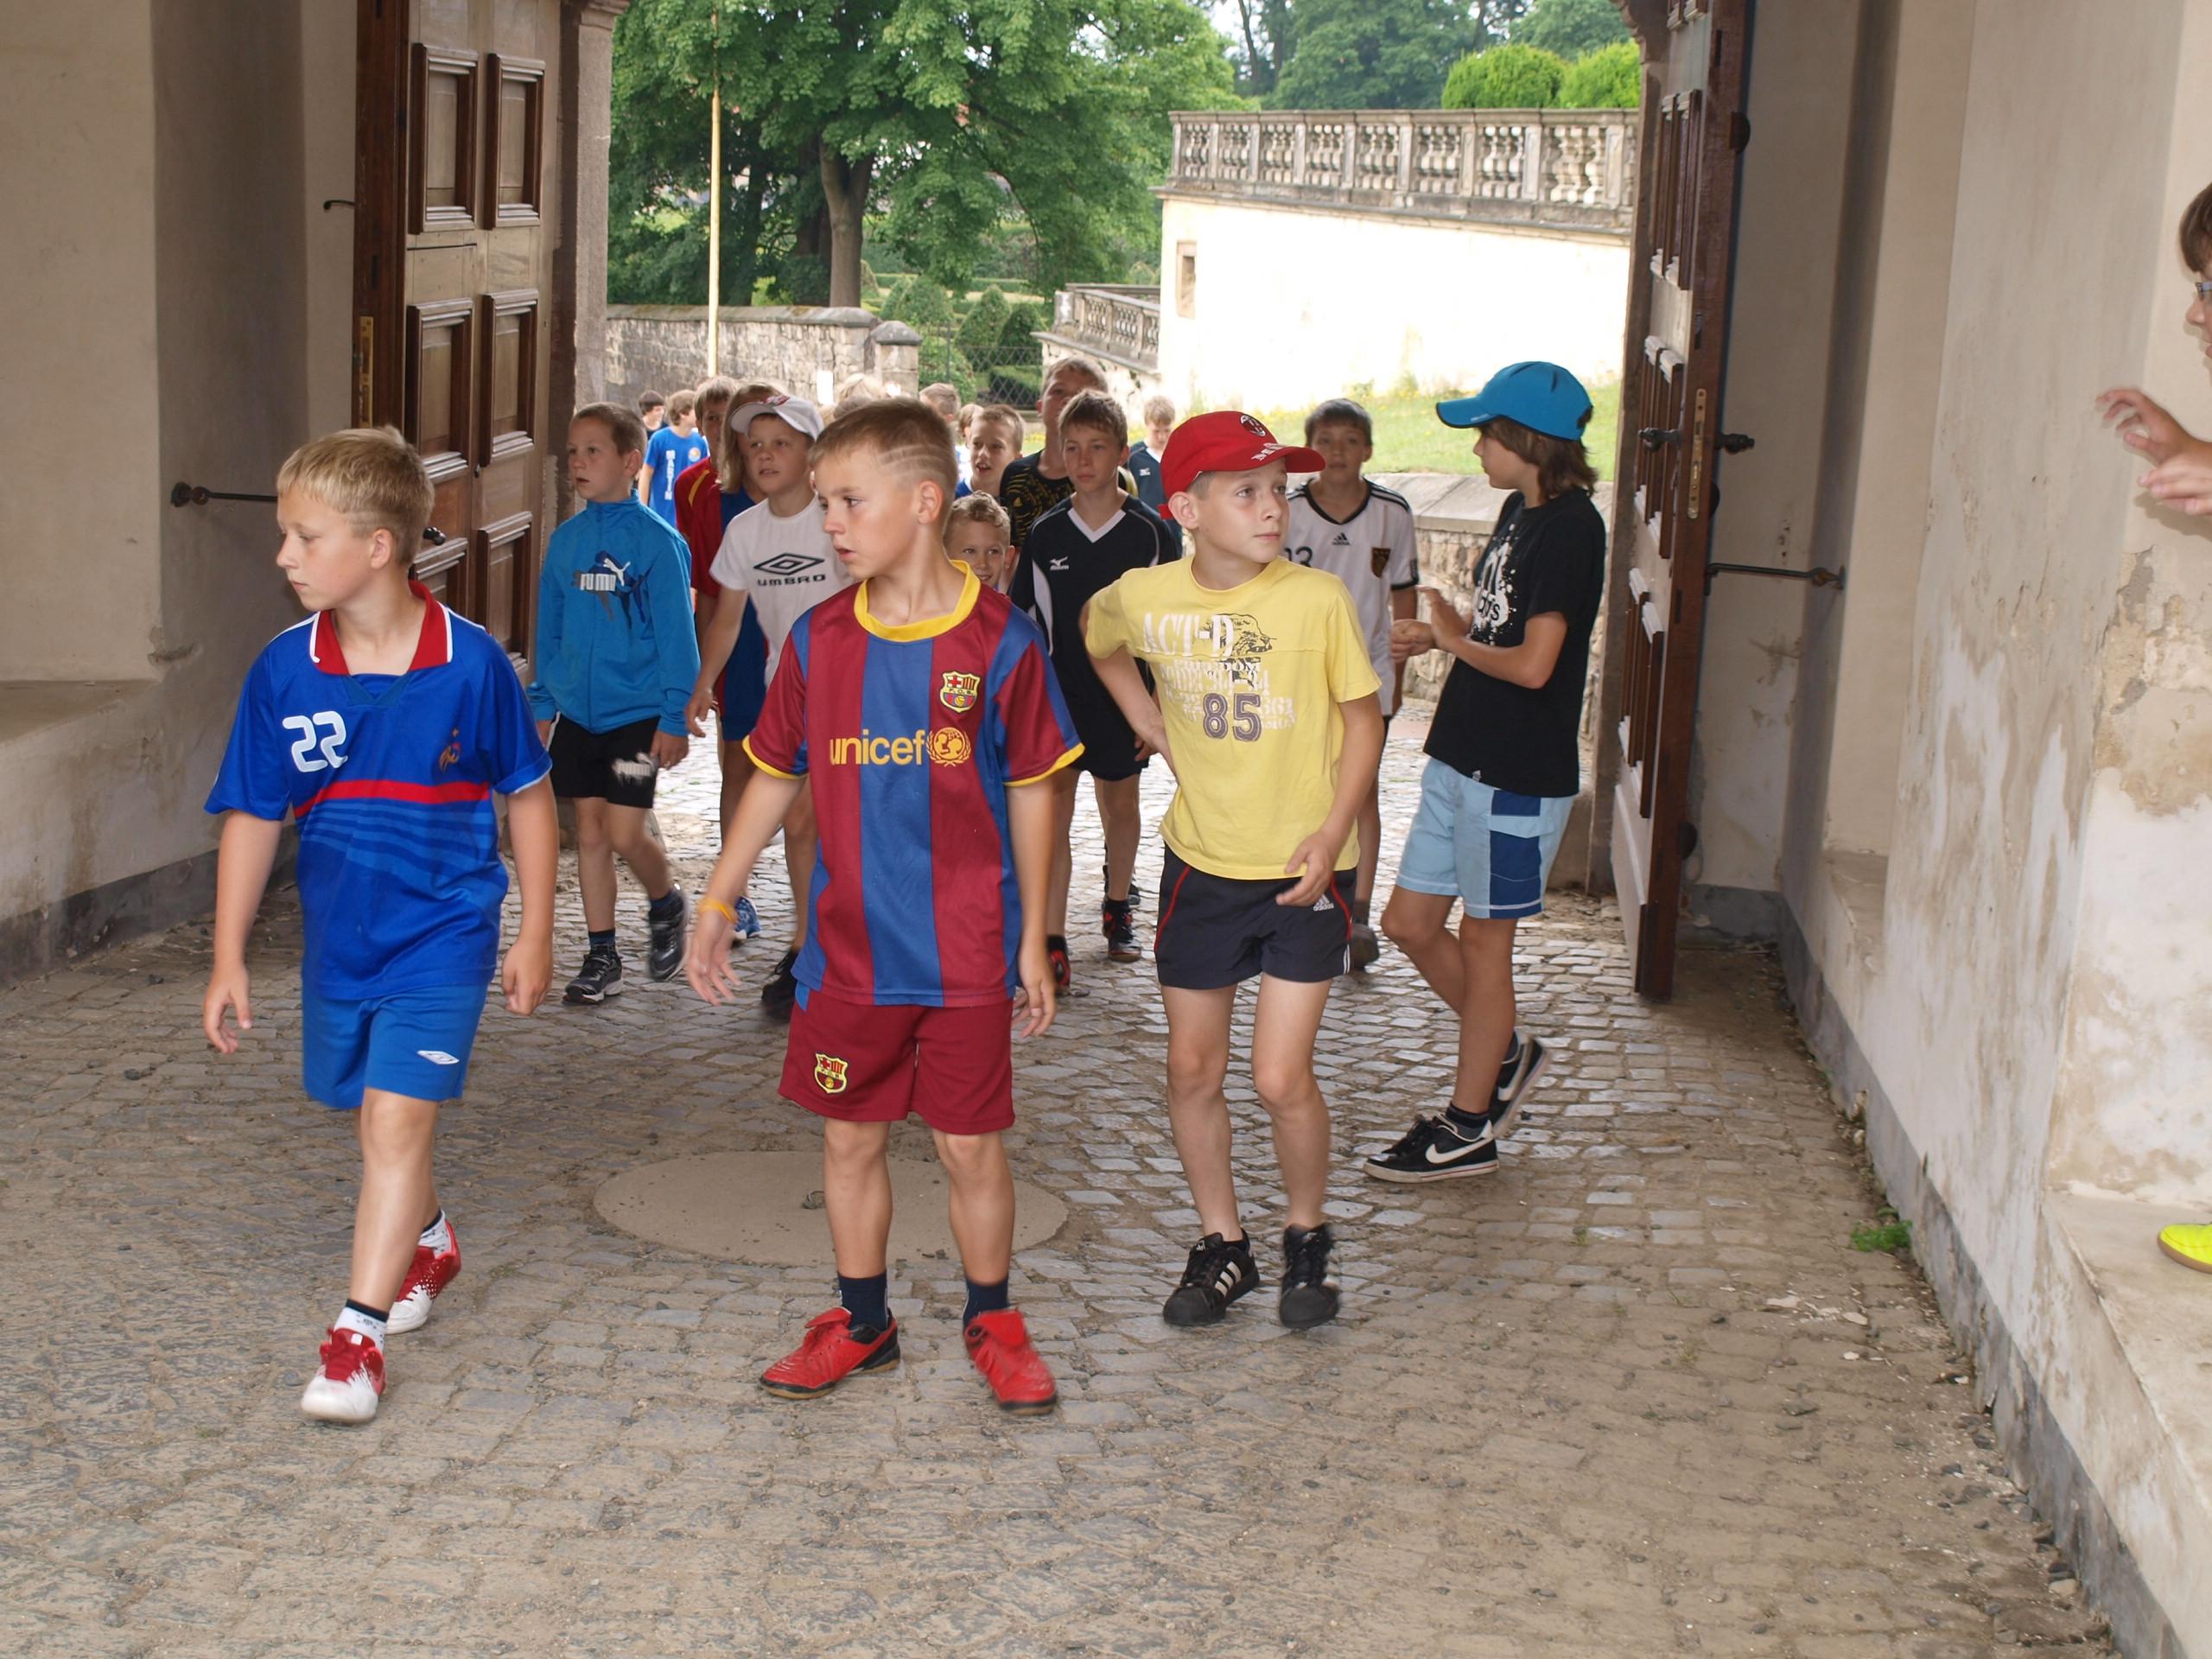 Fotbalové prázdniny Fotbalový kemp Fotbalové Prázdniny 2012